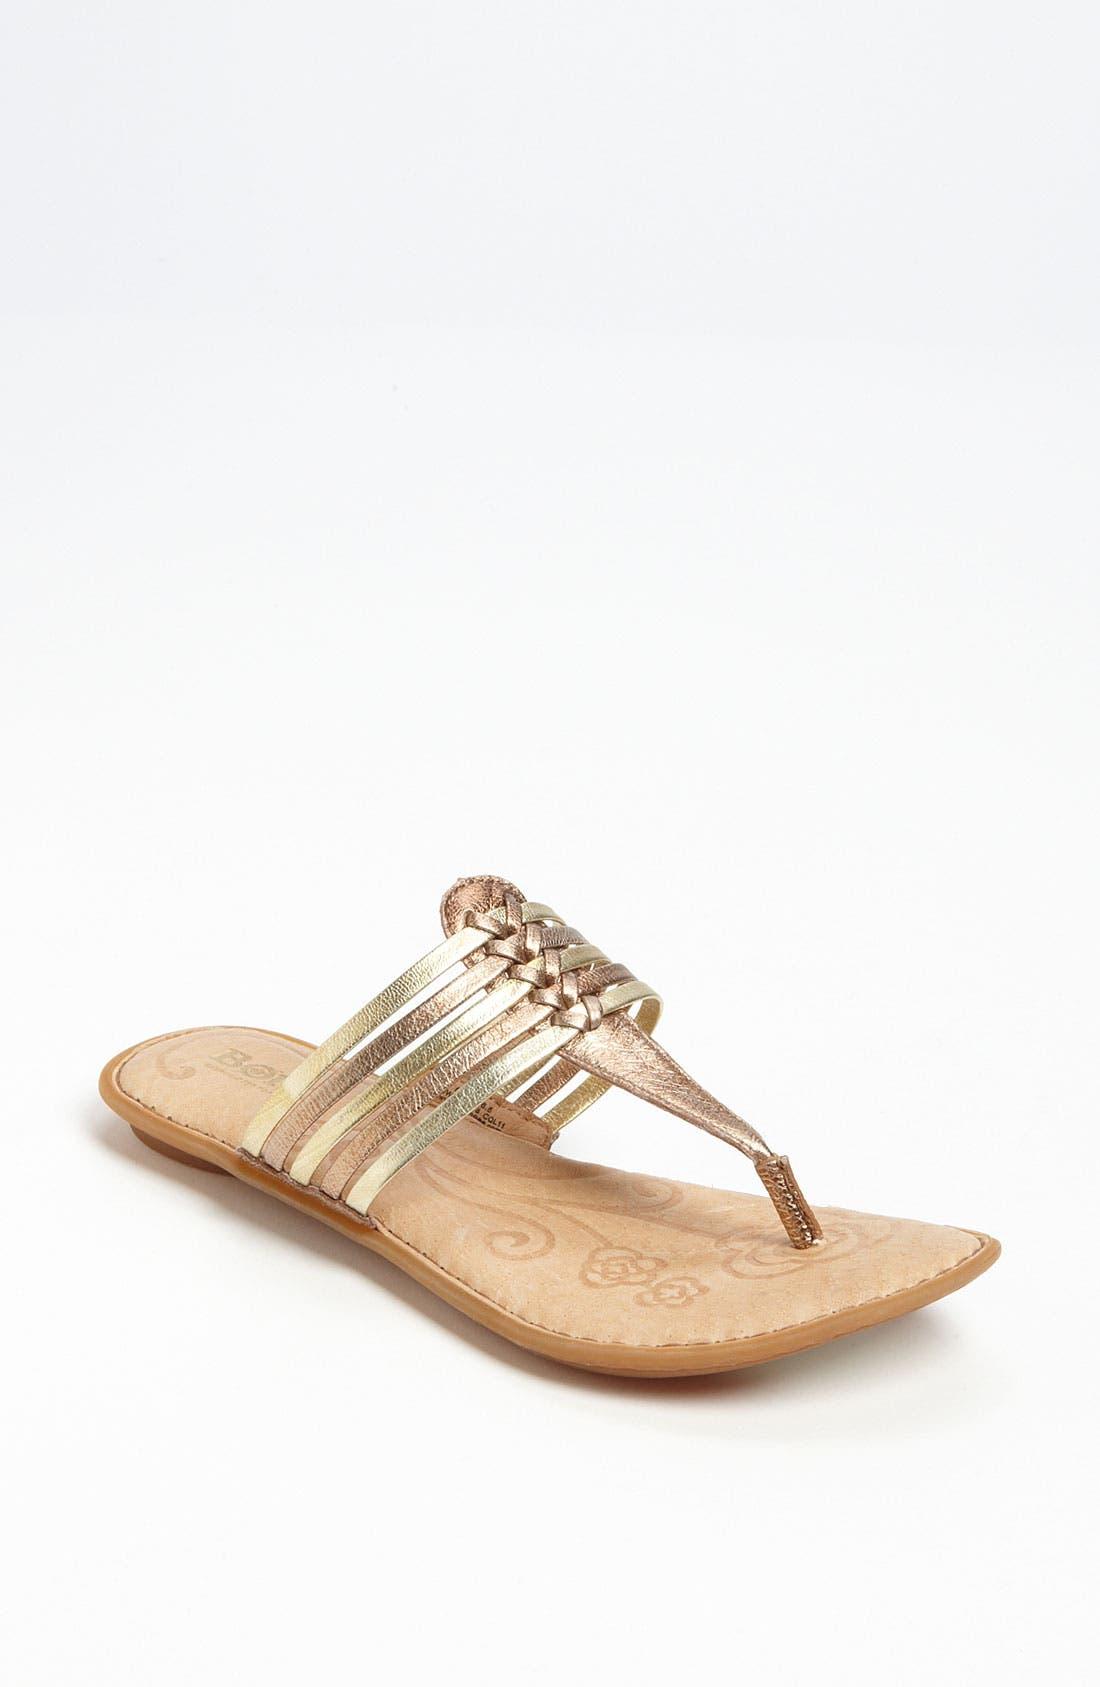 Alternate Image 1 Selected - Børn 'Hoda' Sandal